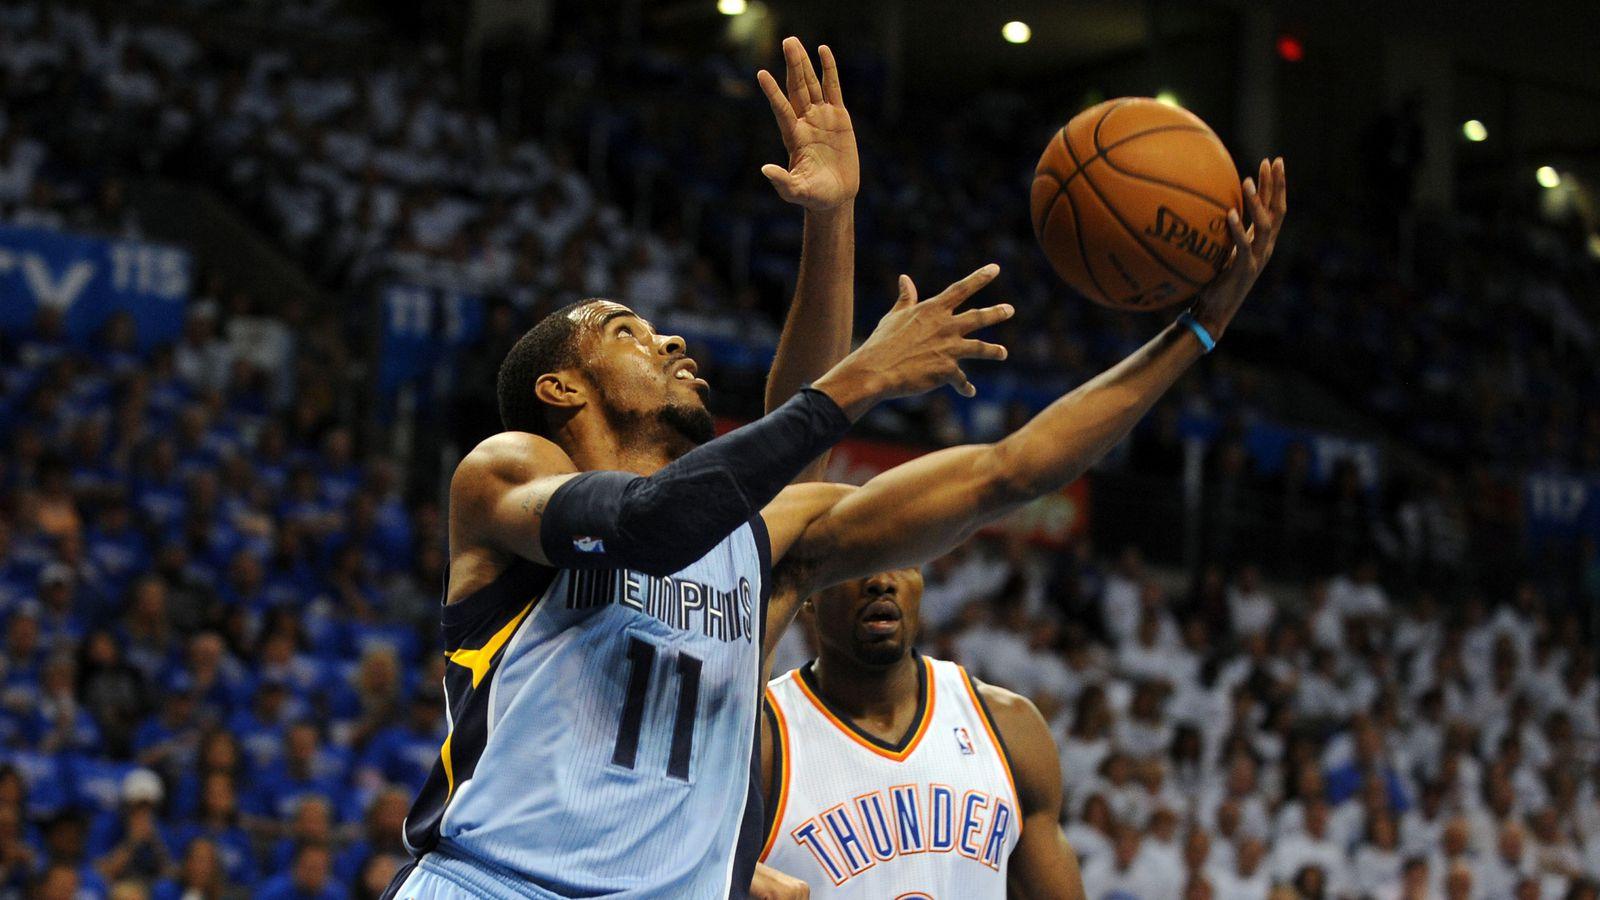 Nba Playoffs 2014 Okc Vs Memphis | Basketball Scores